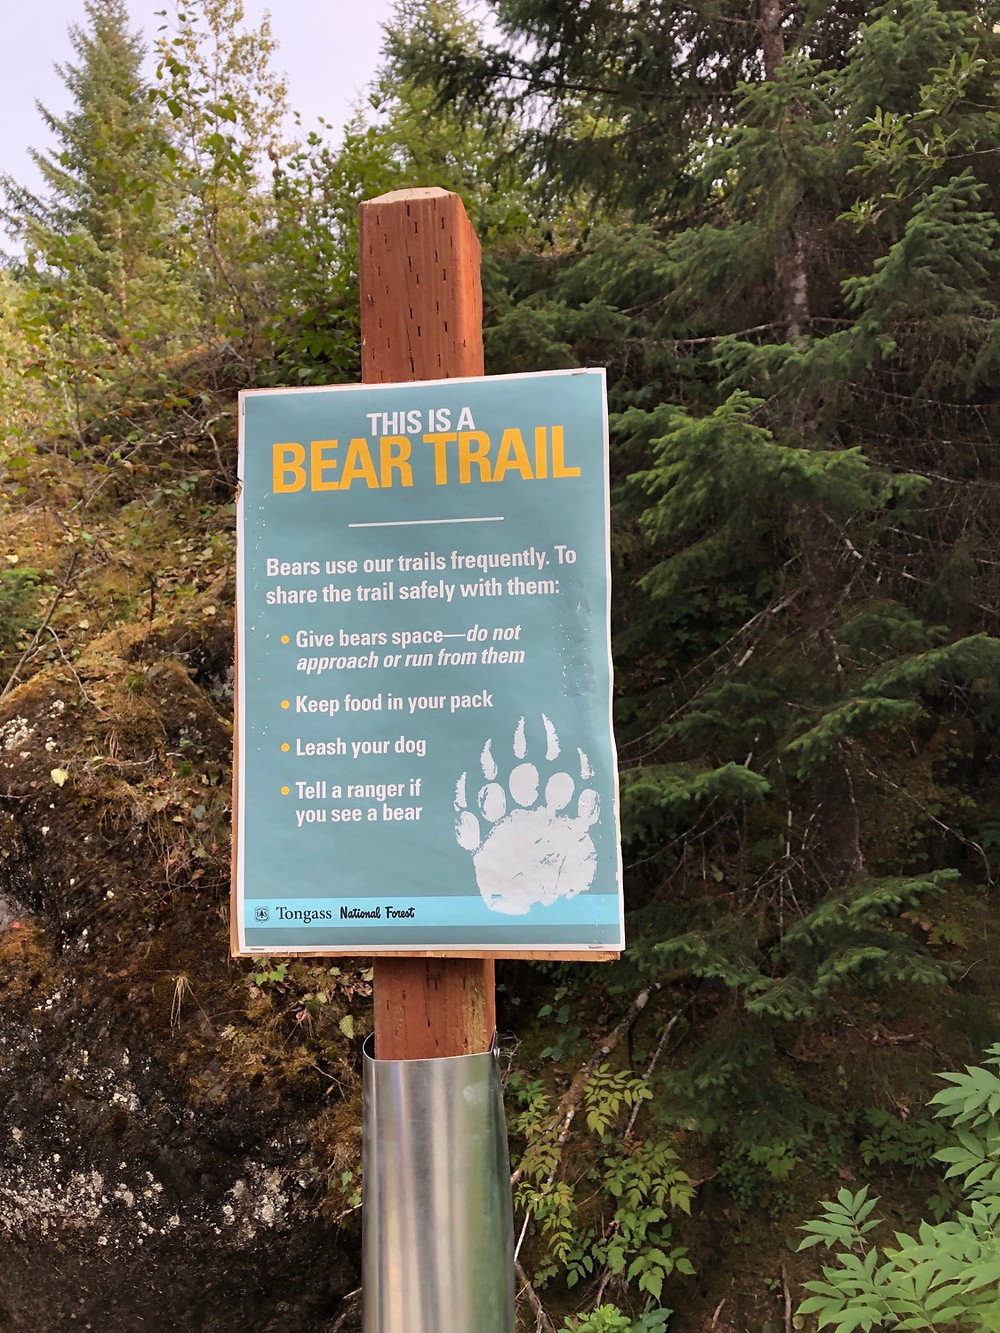 Bear trail signage